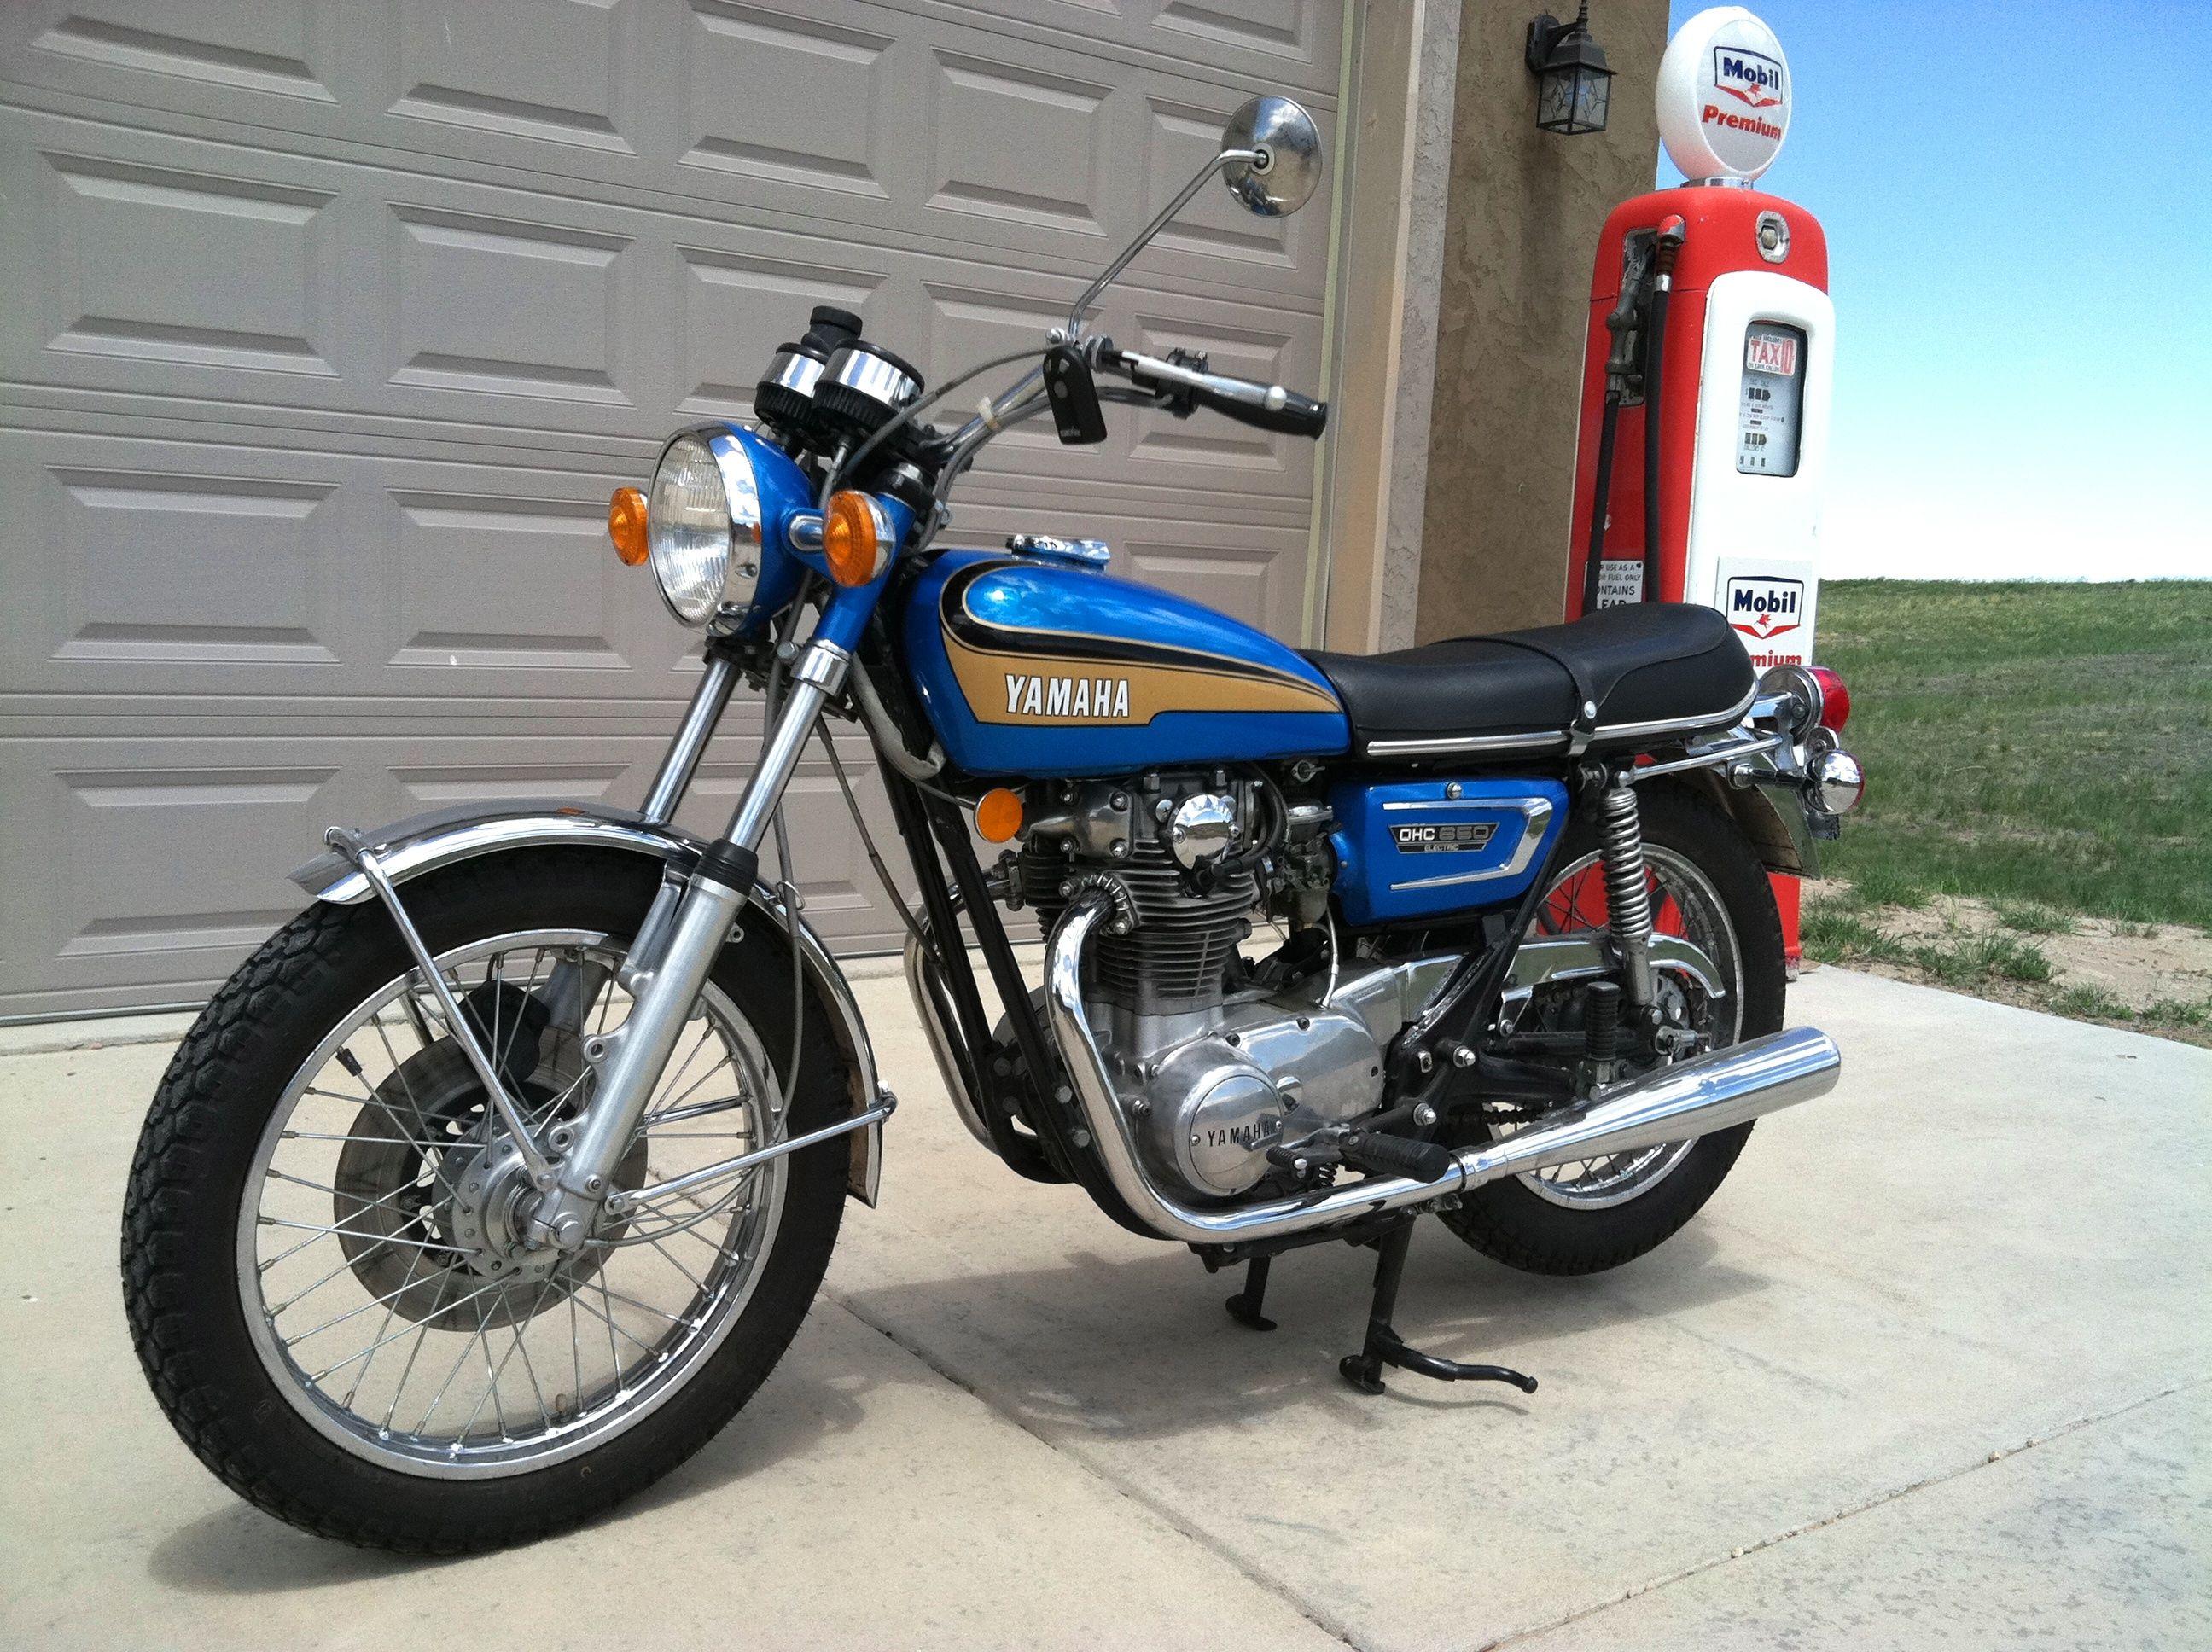 1973 Yamaha Tx650 650cc W Five Speed Transmission Classic